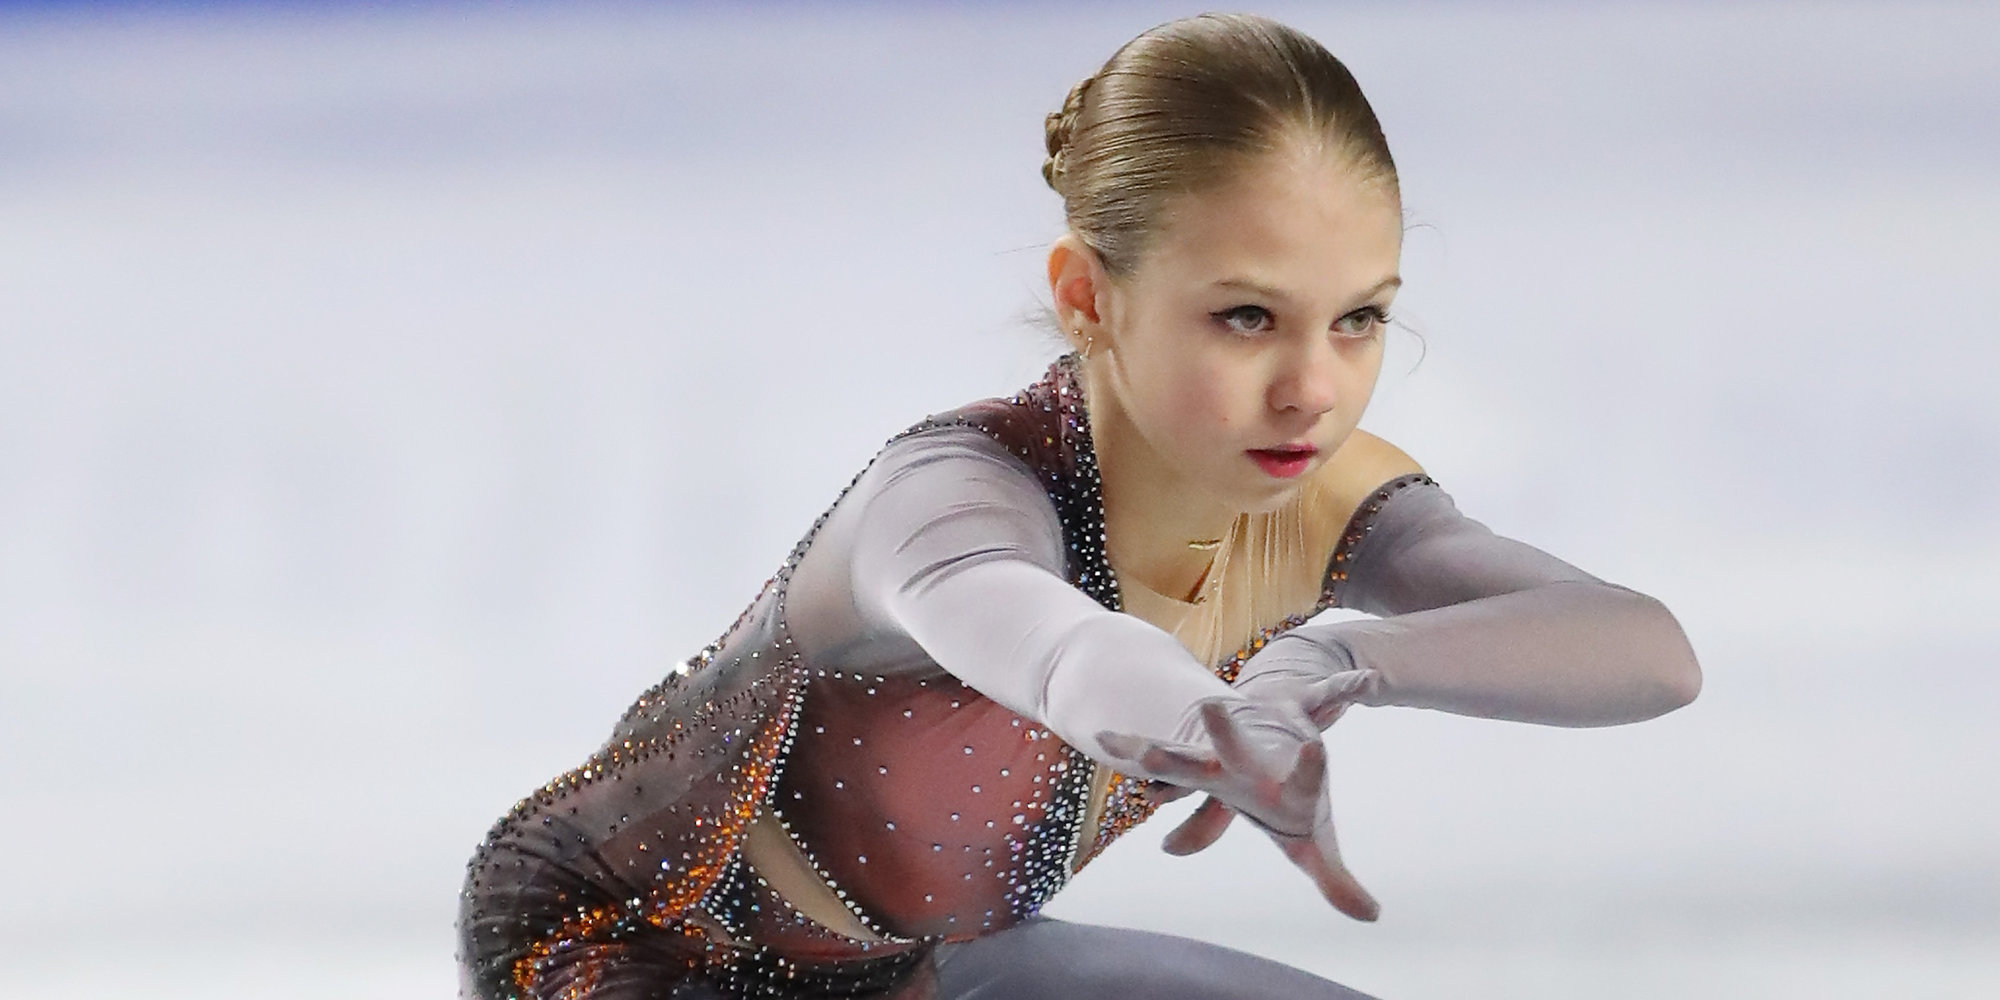 Трусова назвала Медведеву примером трудолюбия - фото